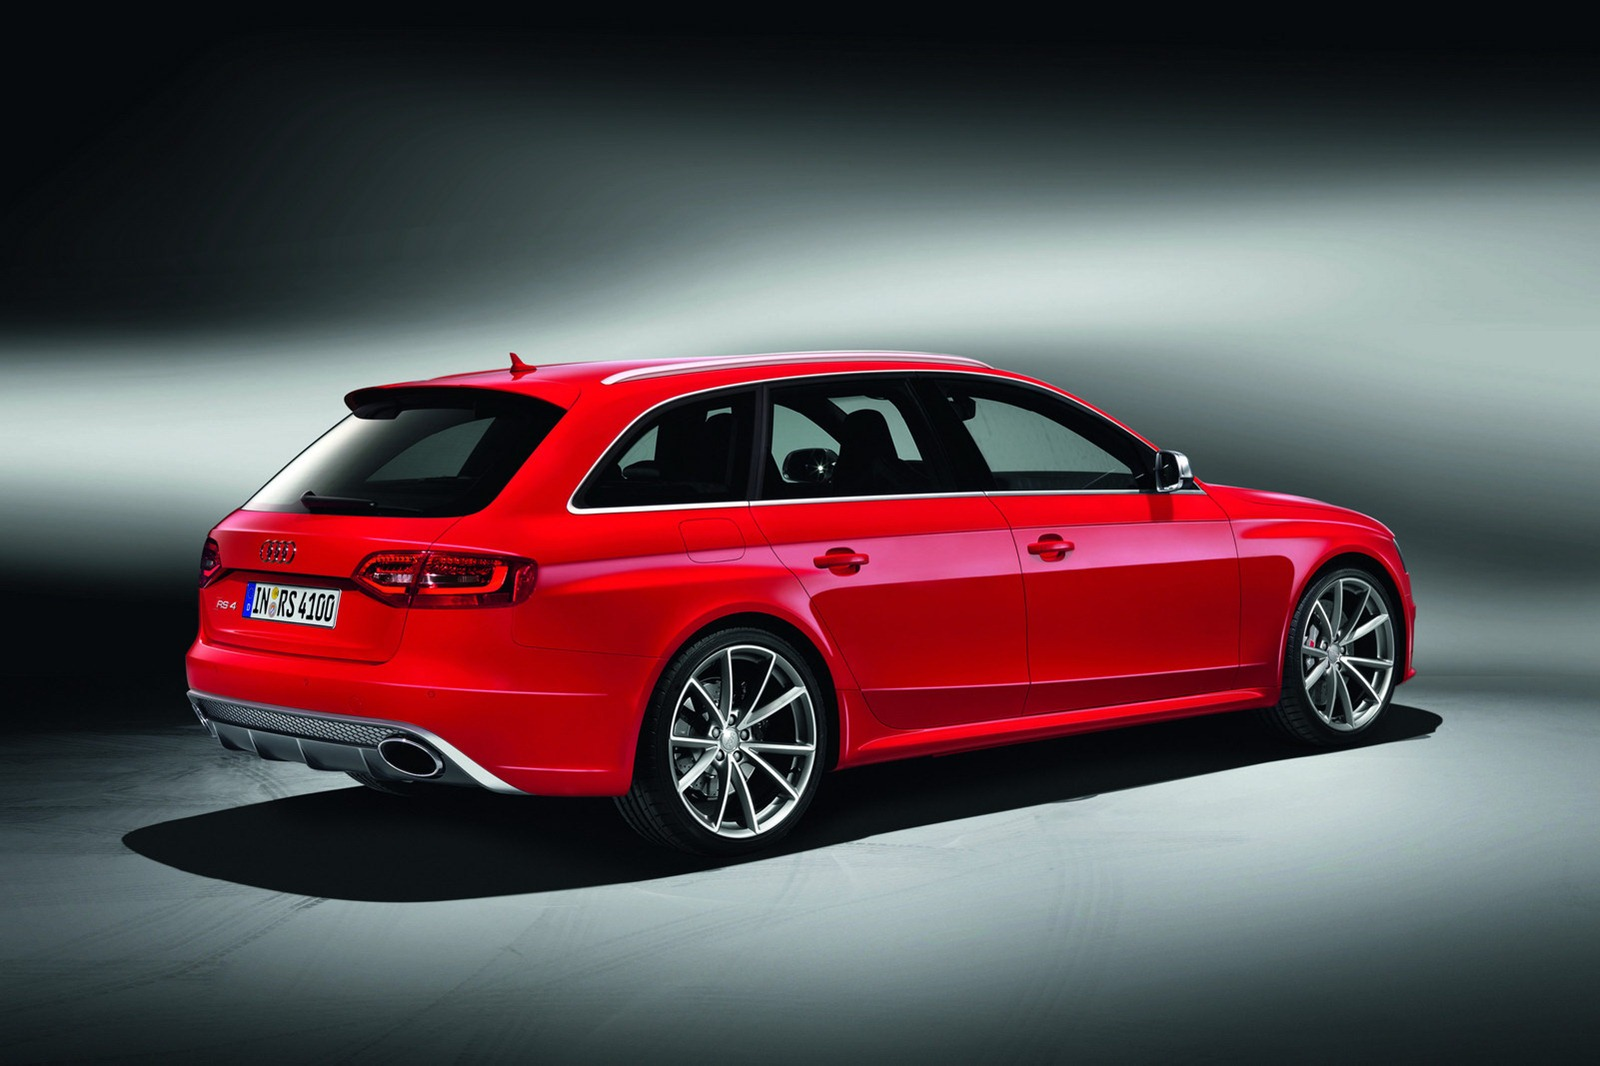 New Audi 2013 Rs4 Maze